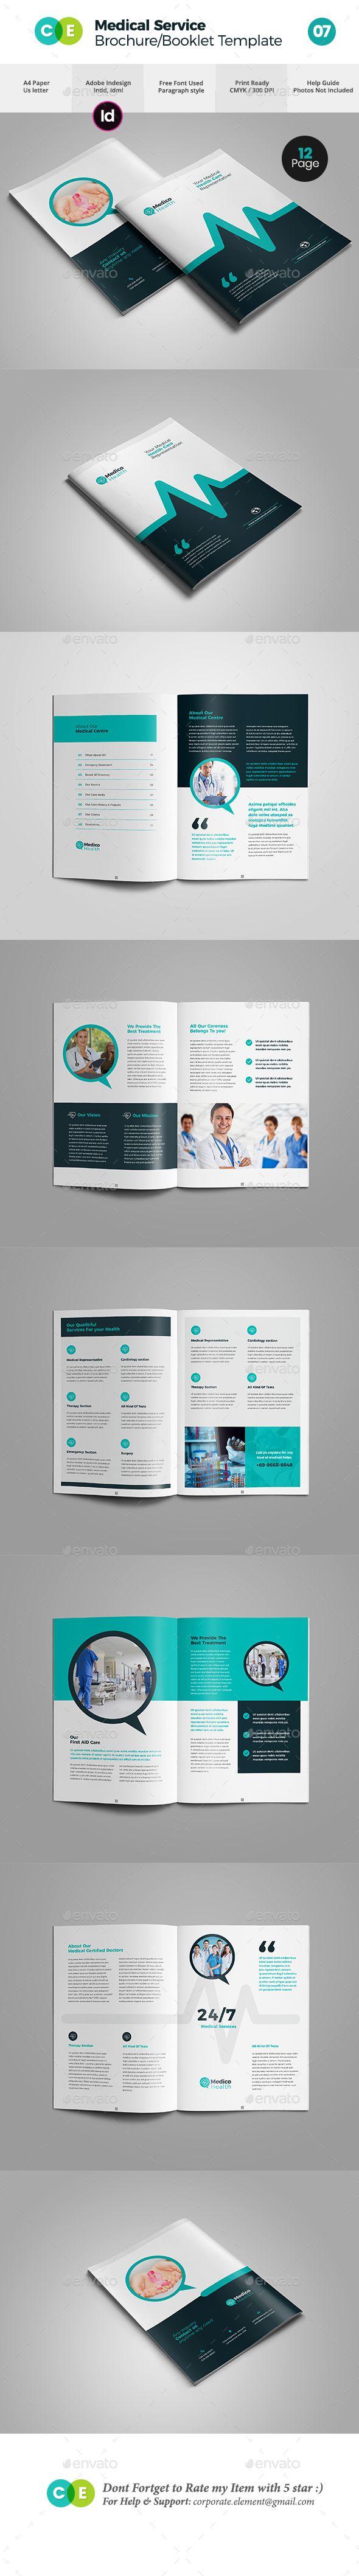 Booklet Brochure Template | Medical Service Booklet Brochure Template V07 Pinterest Diseno